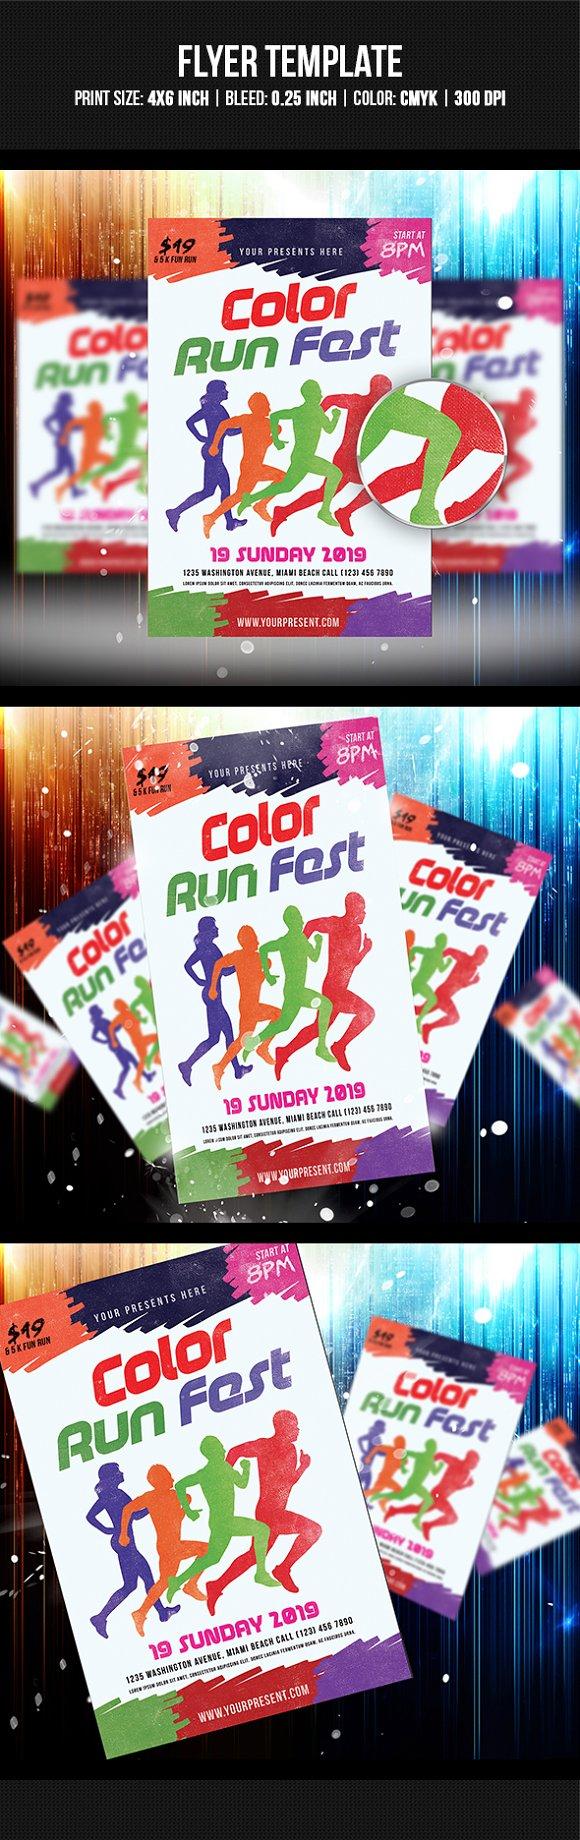 color run fest flyer flyer templates creative market